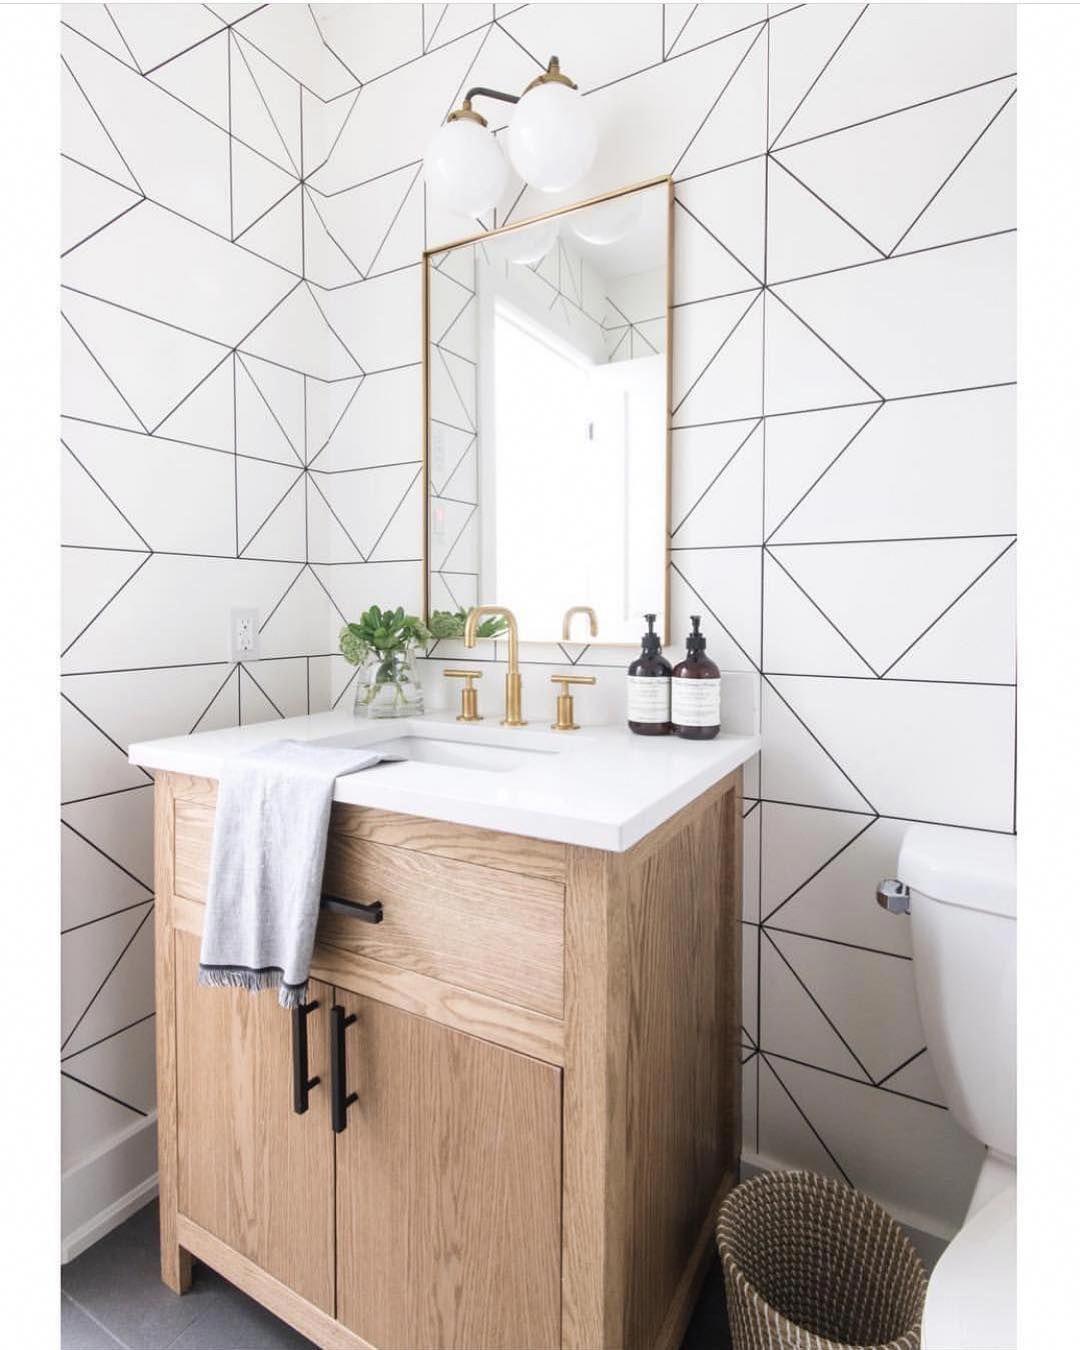 Incredible Bathroom Vanity Decorating Ideas Pinterest Bathroom Bathroom Vanity Decor Bathroom Decor Bathrooms Remodel